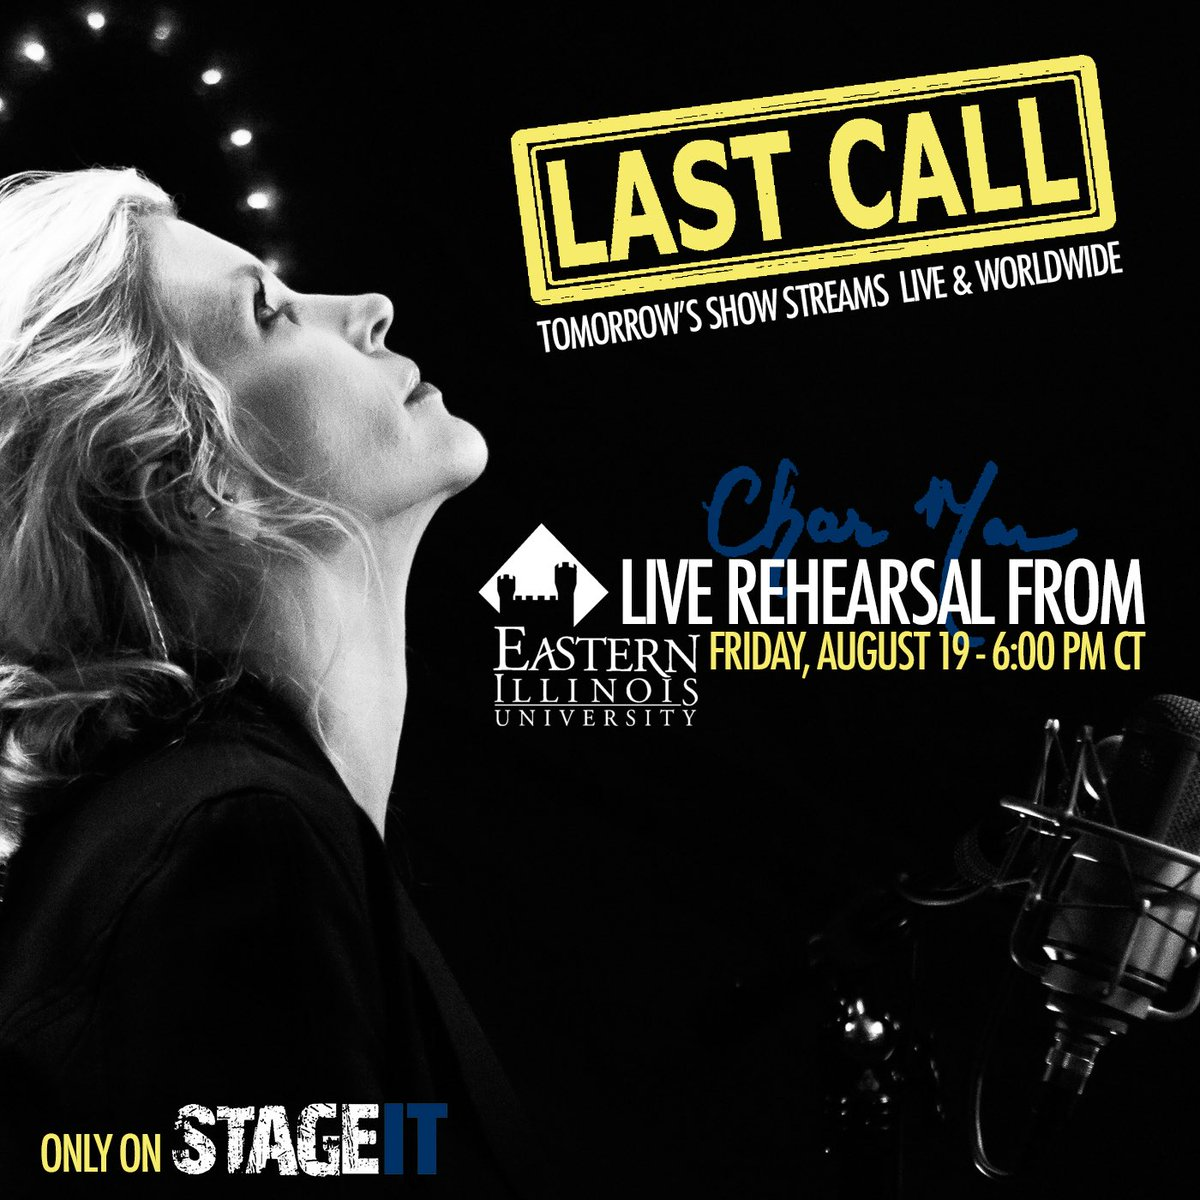 TOMORROW: Watch my live rehearsal from @eiu - anywhere in the world - https://t.co/9YnAxEJNwF #CharMarMusic2016 https://t.co/Wr4BkH5huW